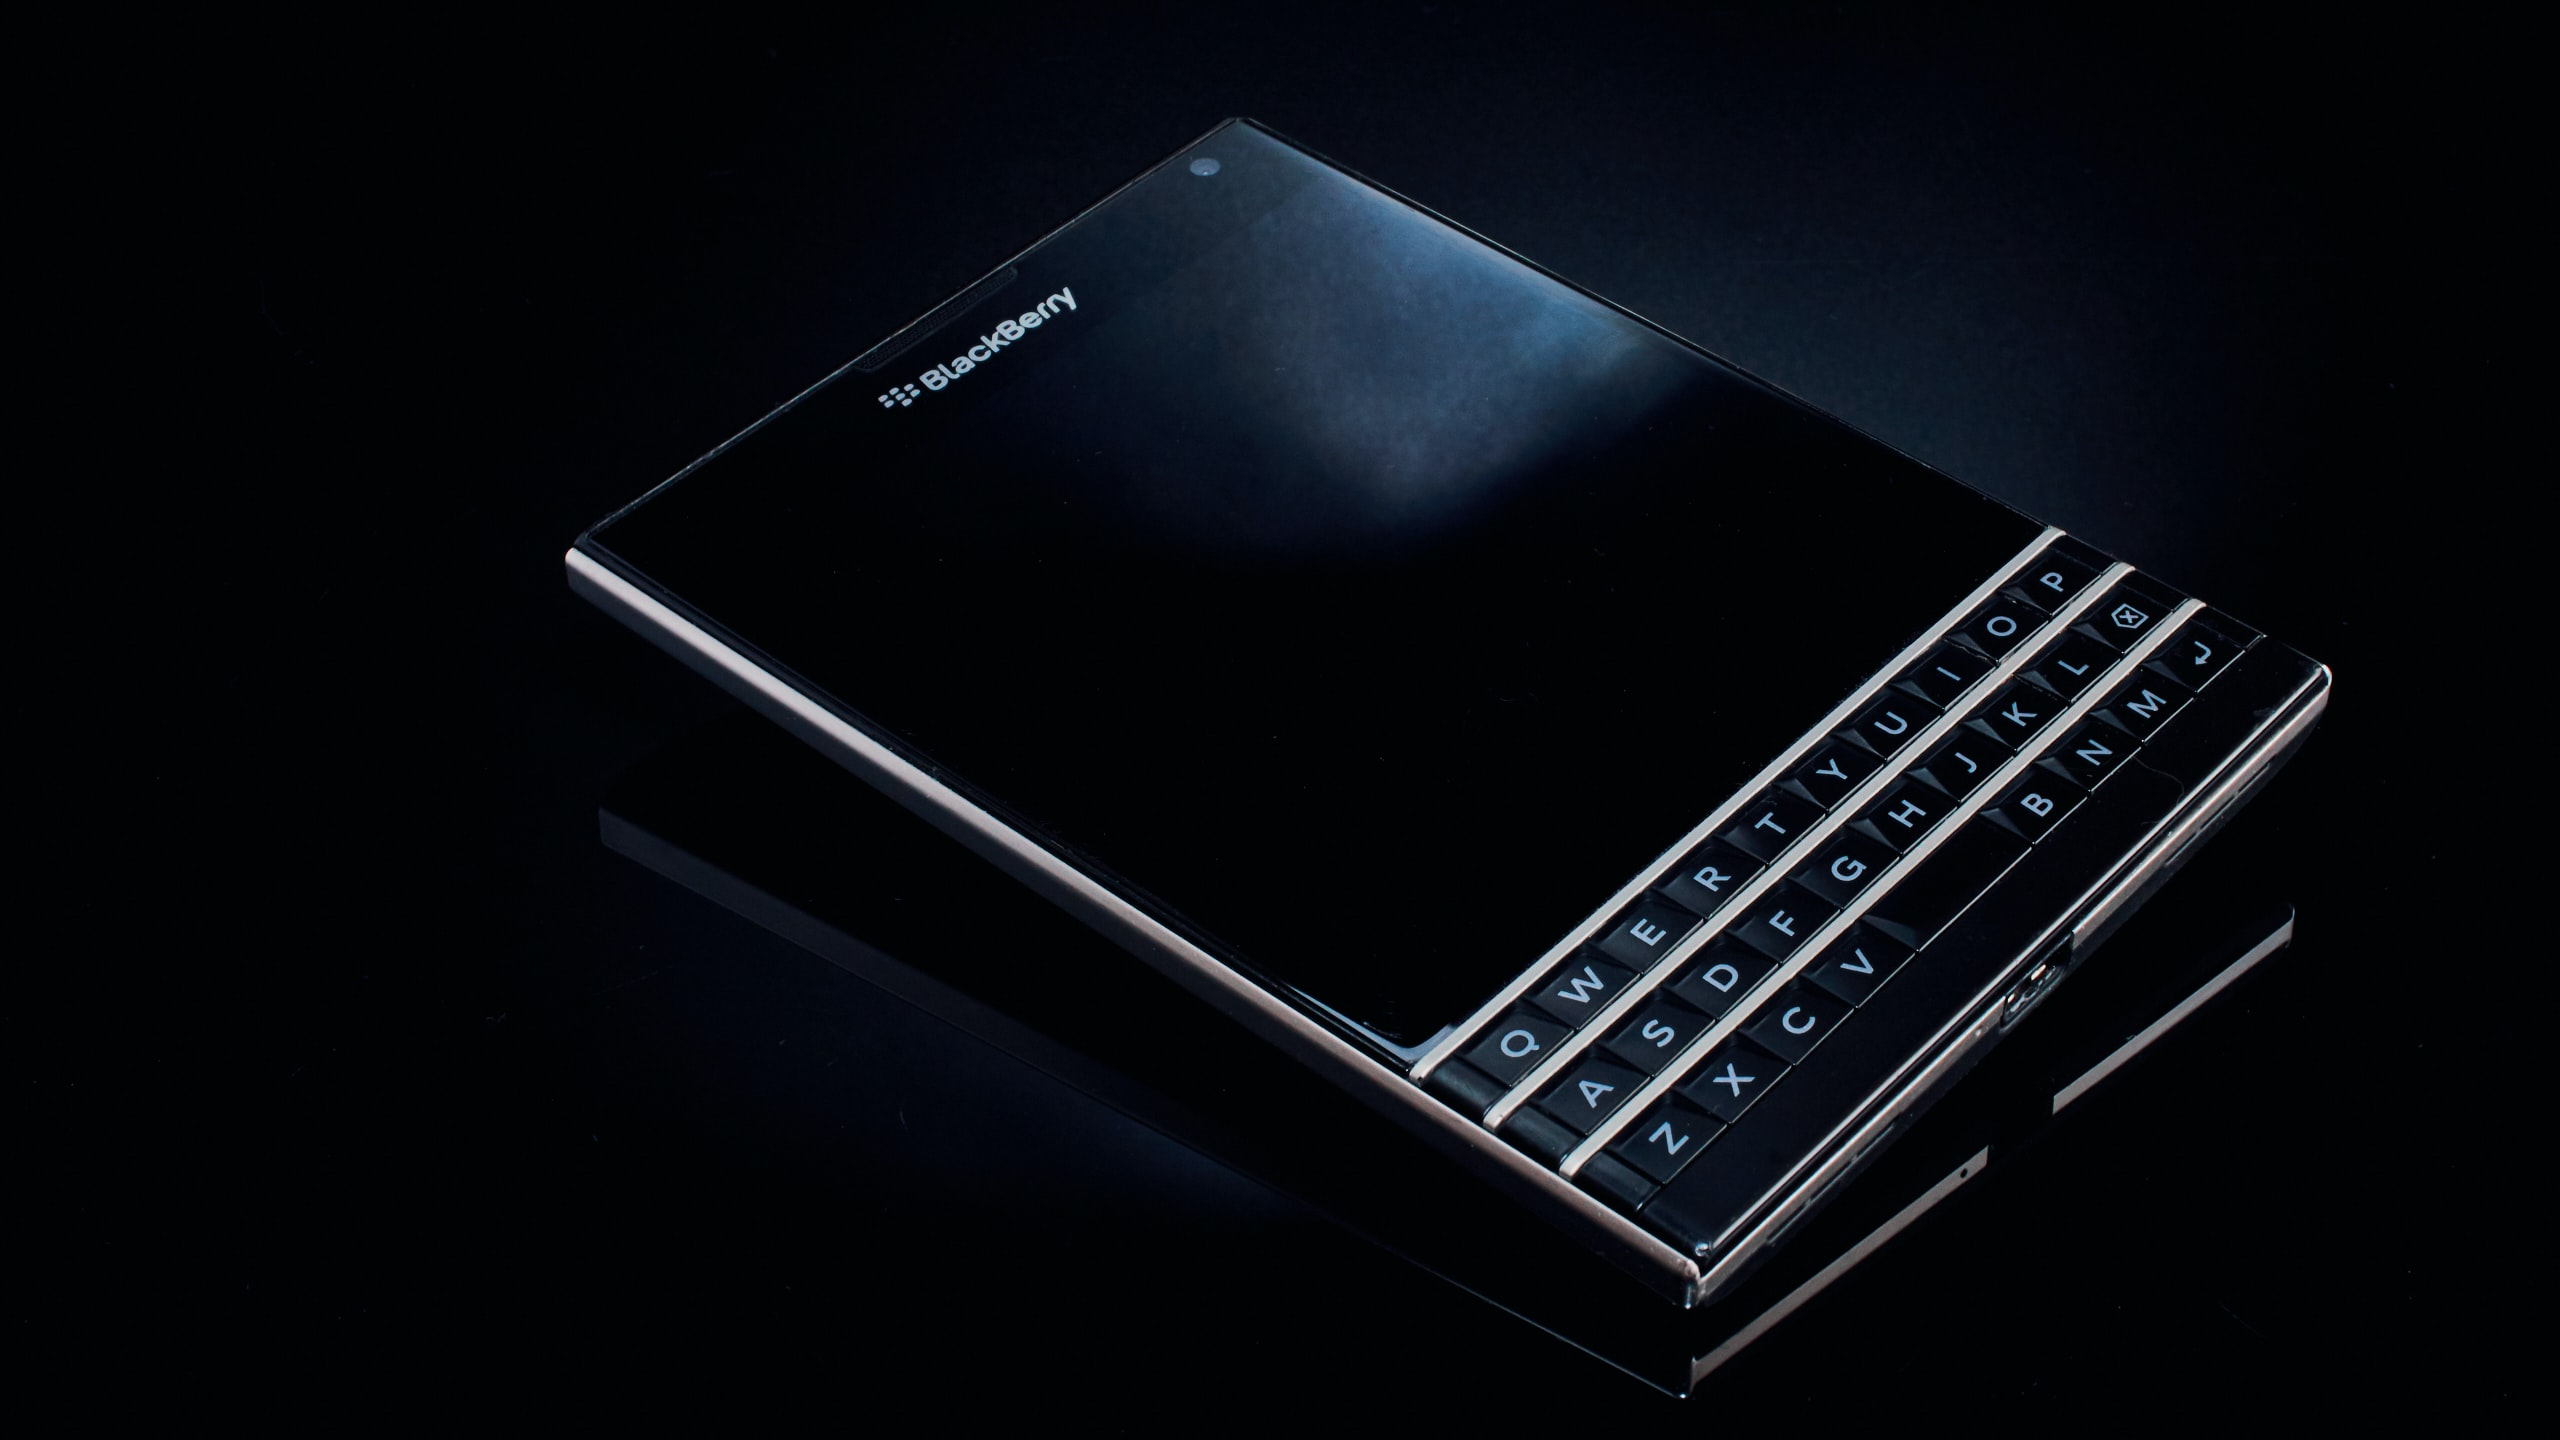 black BlackBerry Passport smartphone